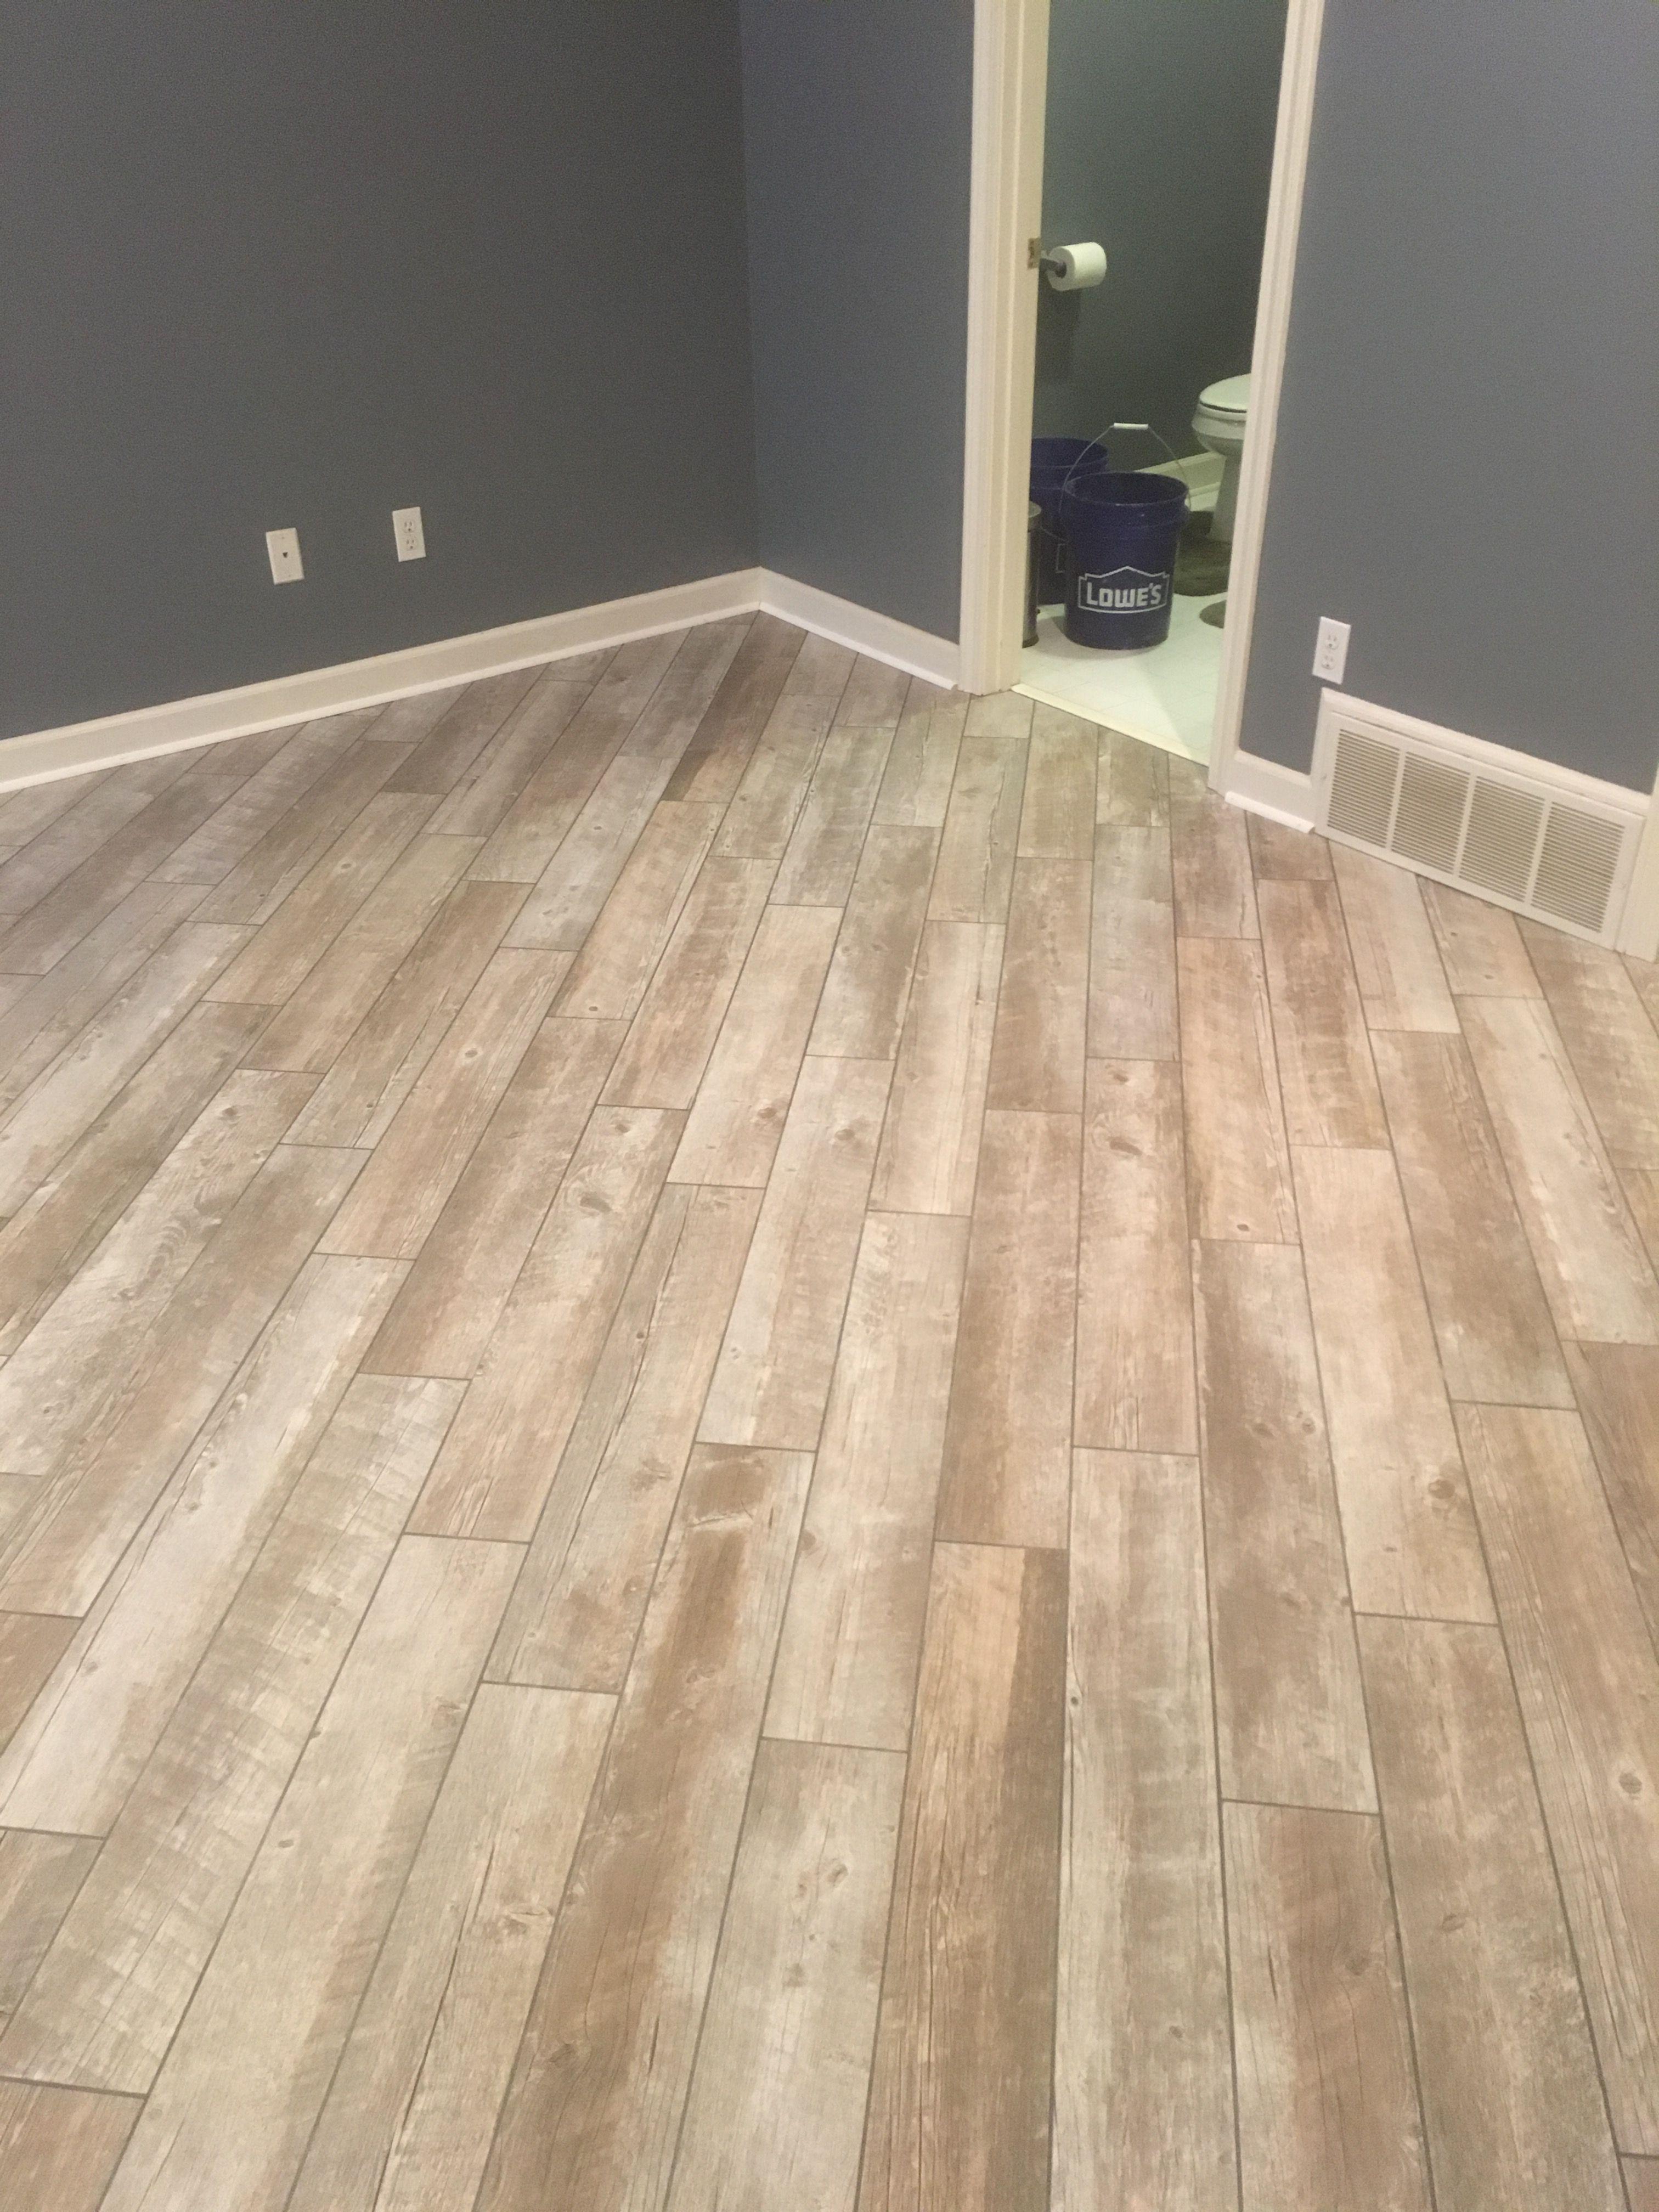 Flooring Laminate Hardwood Contractor Memphis Tn Flooring Floor Installation Flooring Contractor